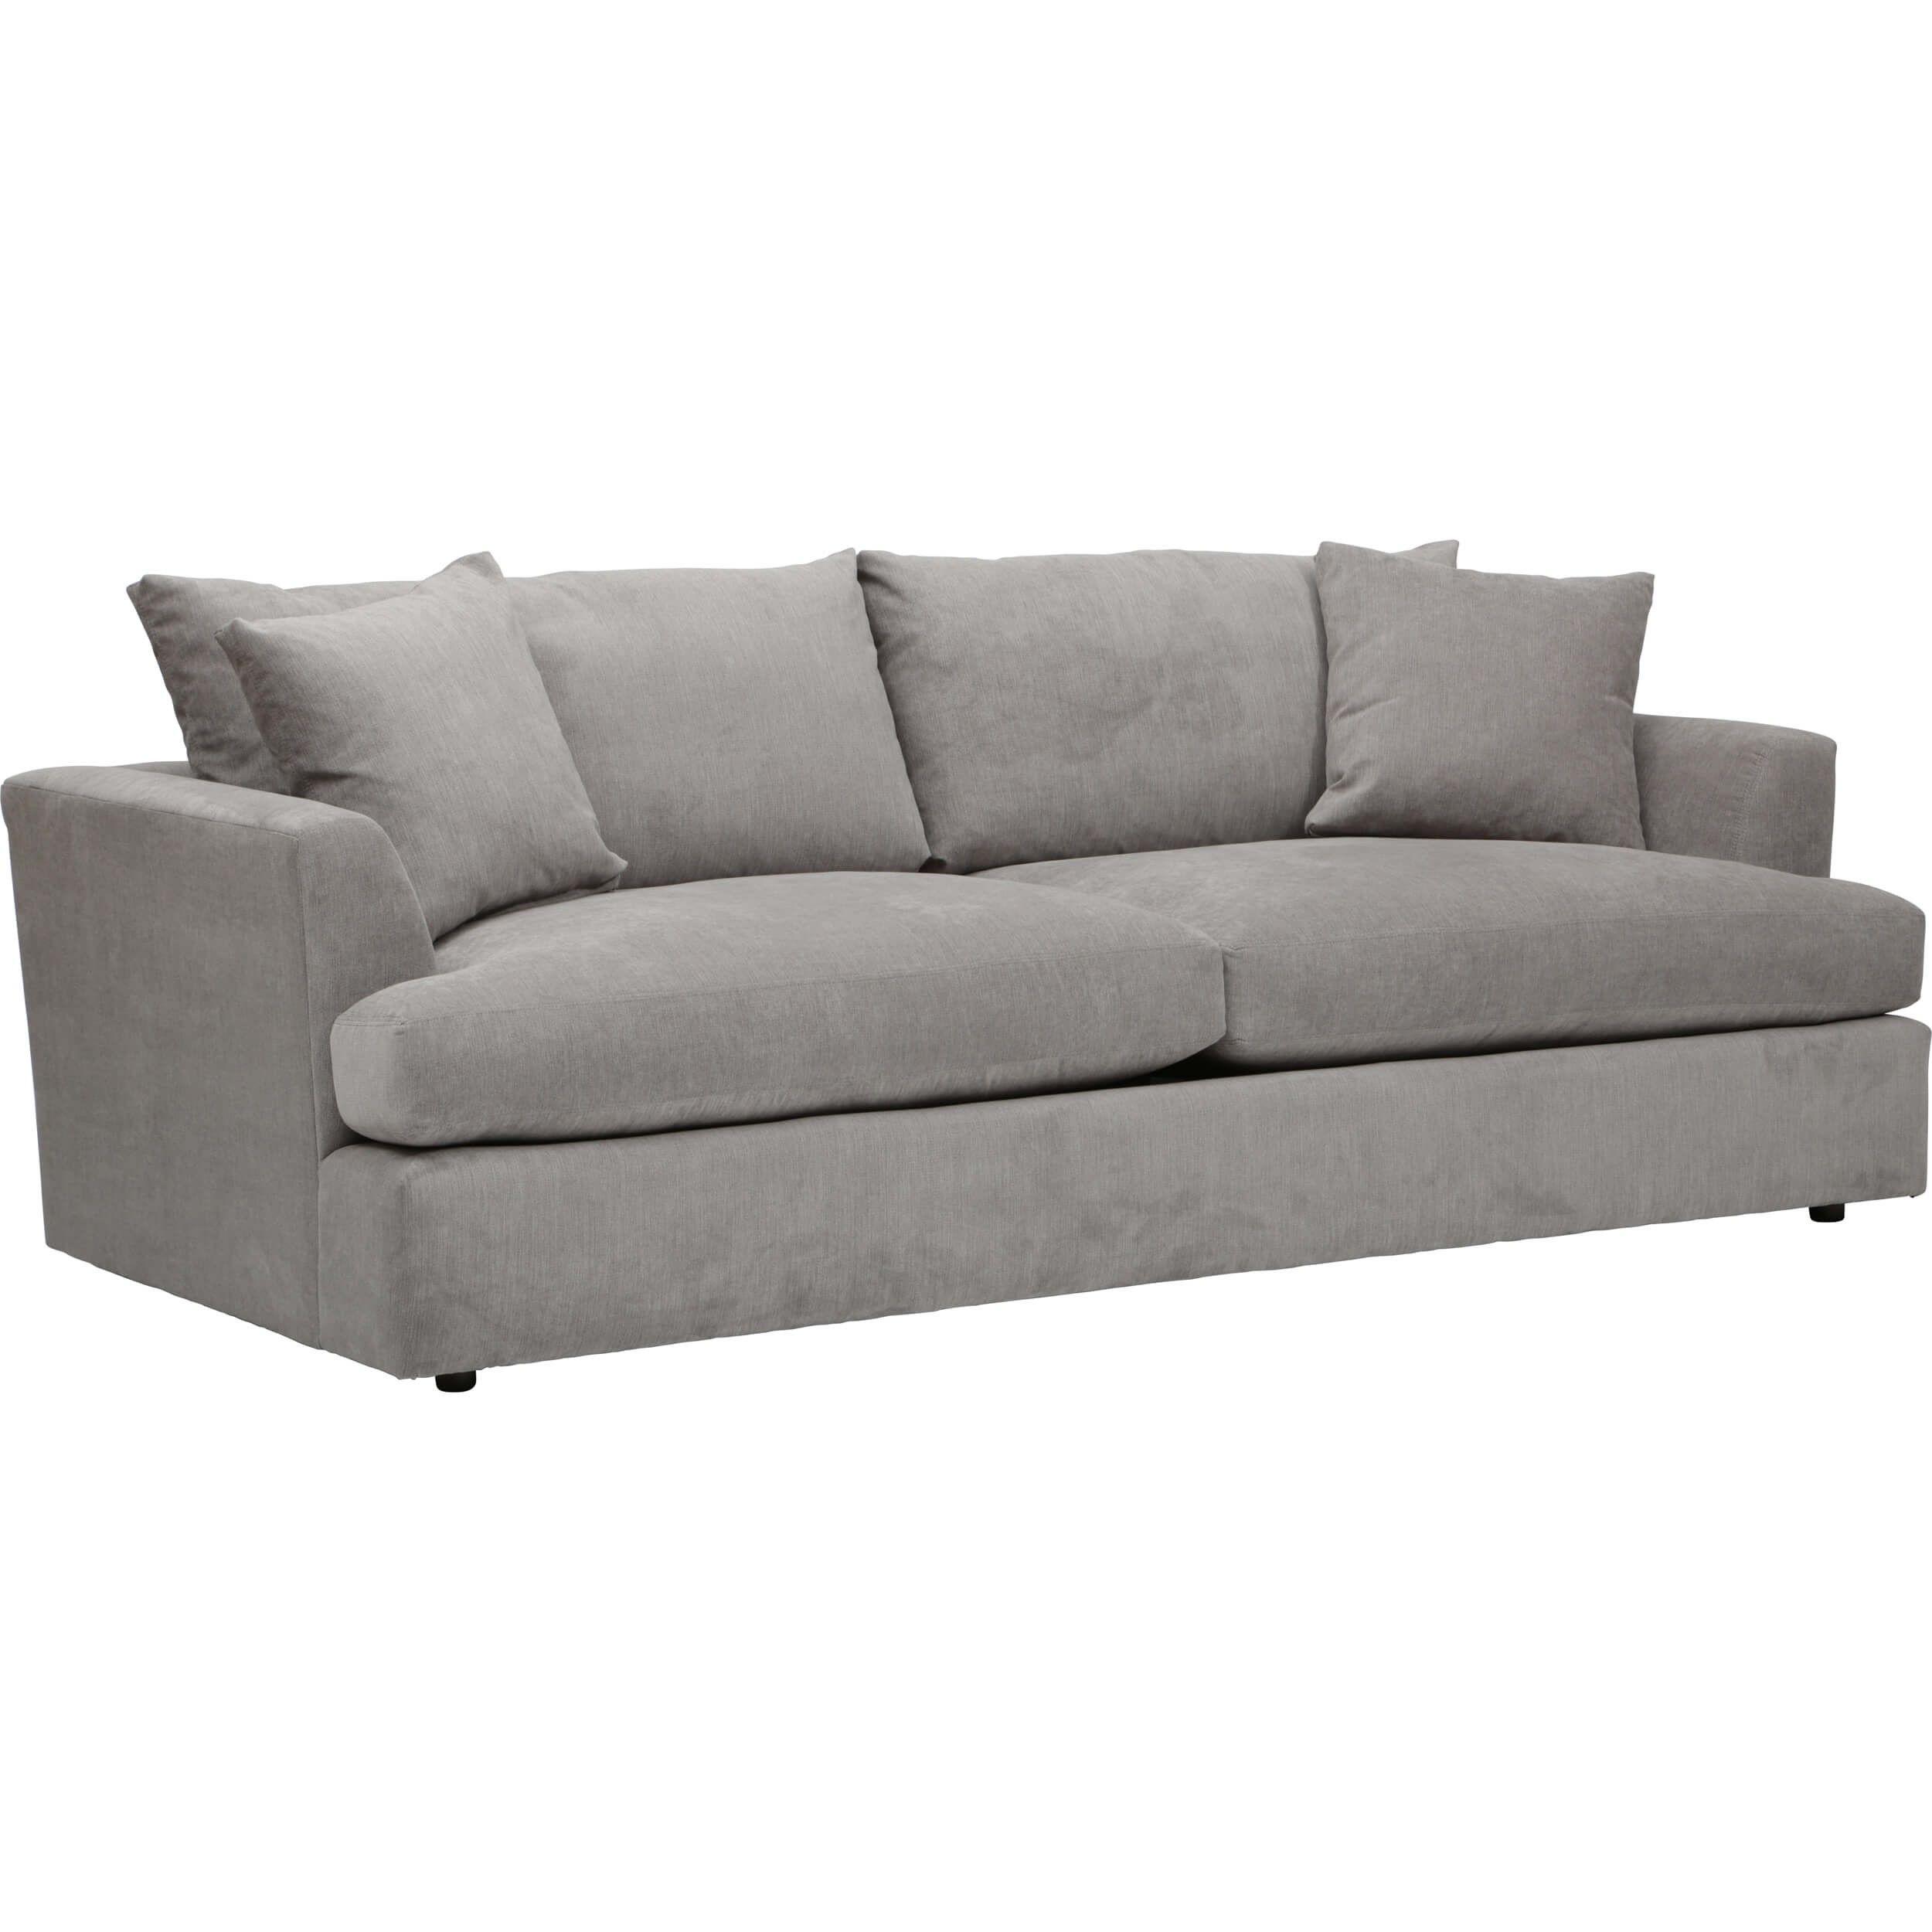 Andre Sofa Graceland Slate Sofa Fabric Sofa Couches Living